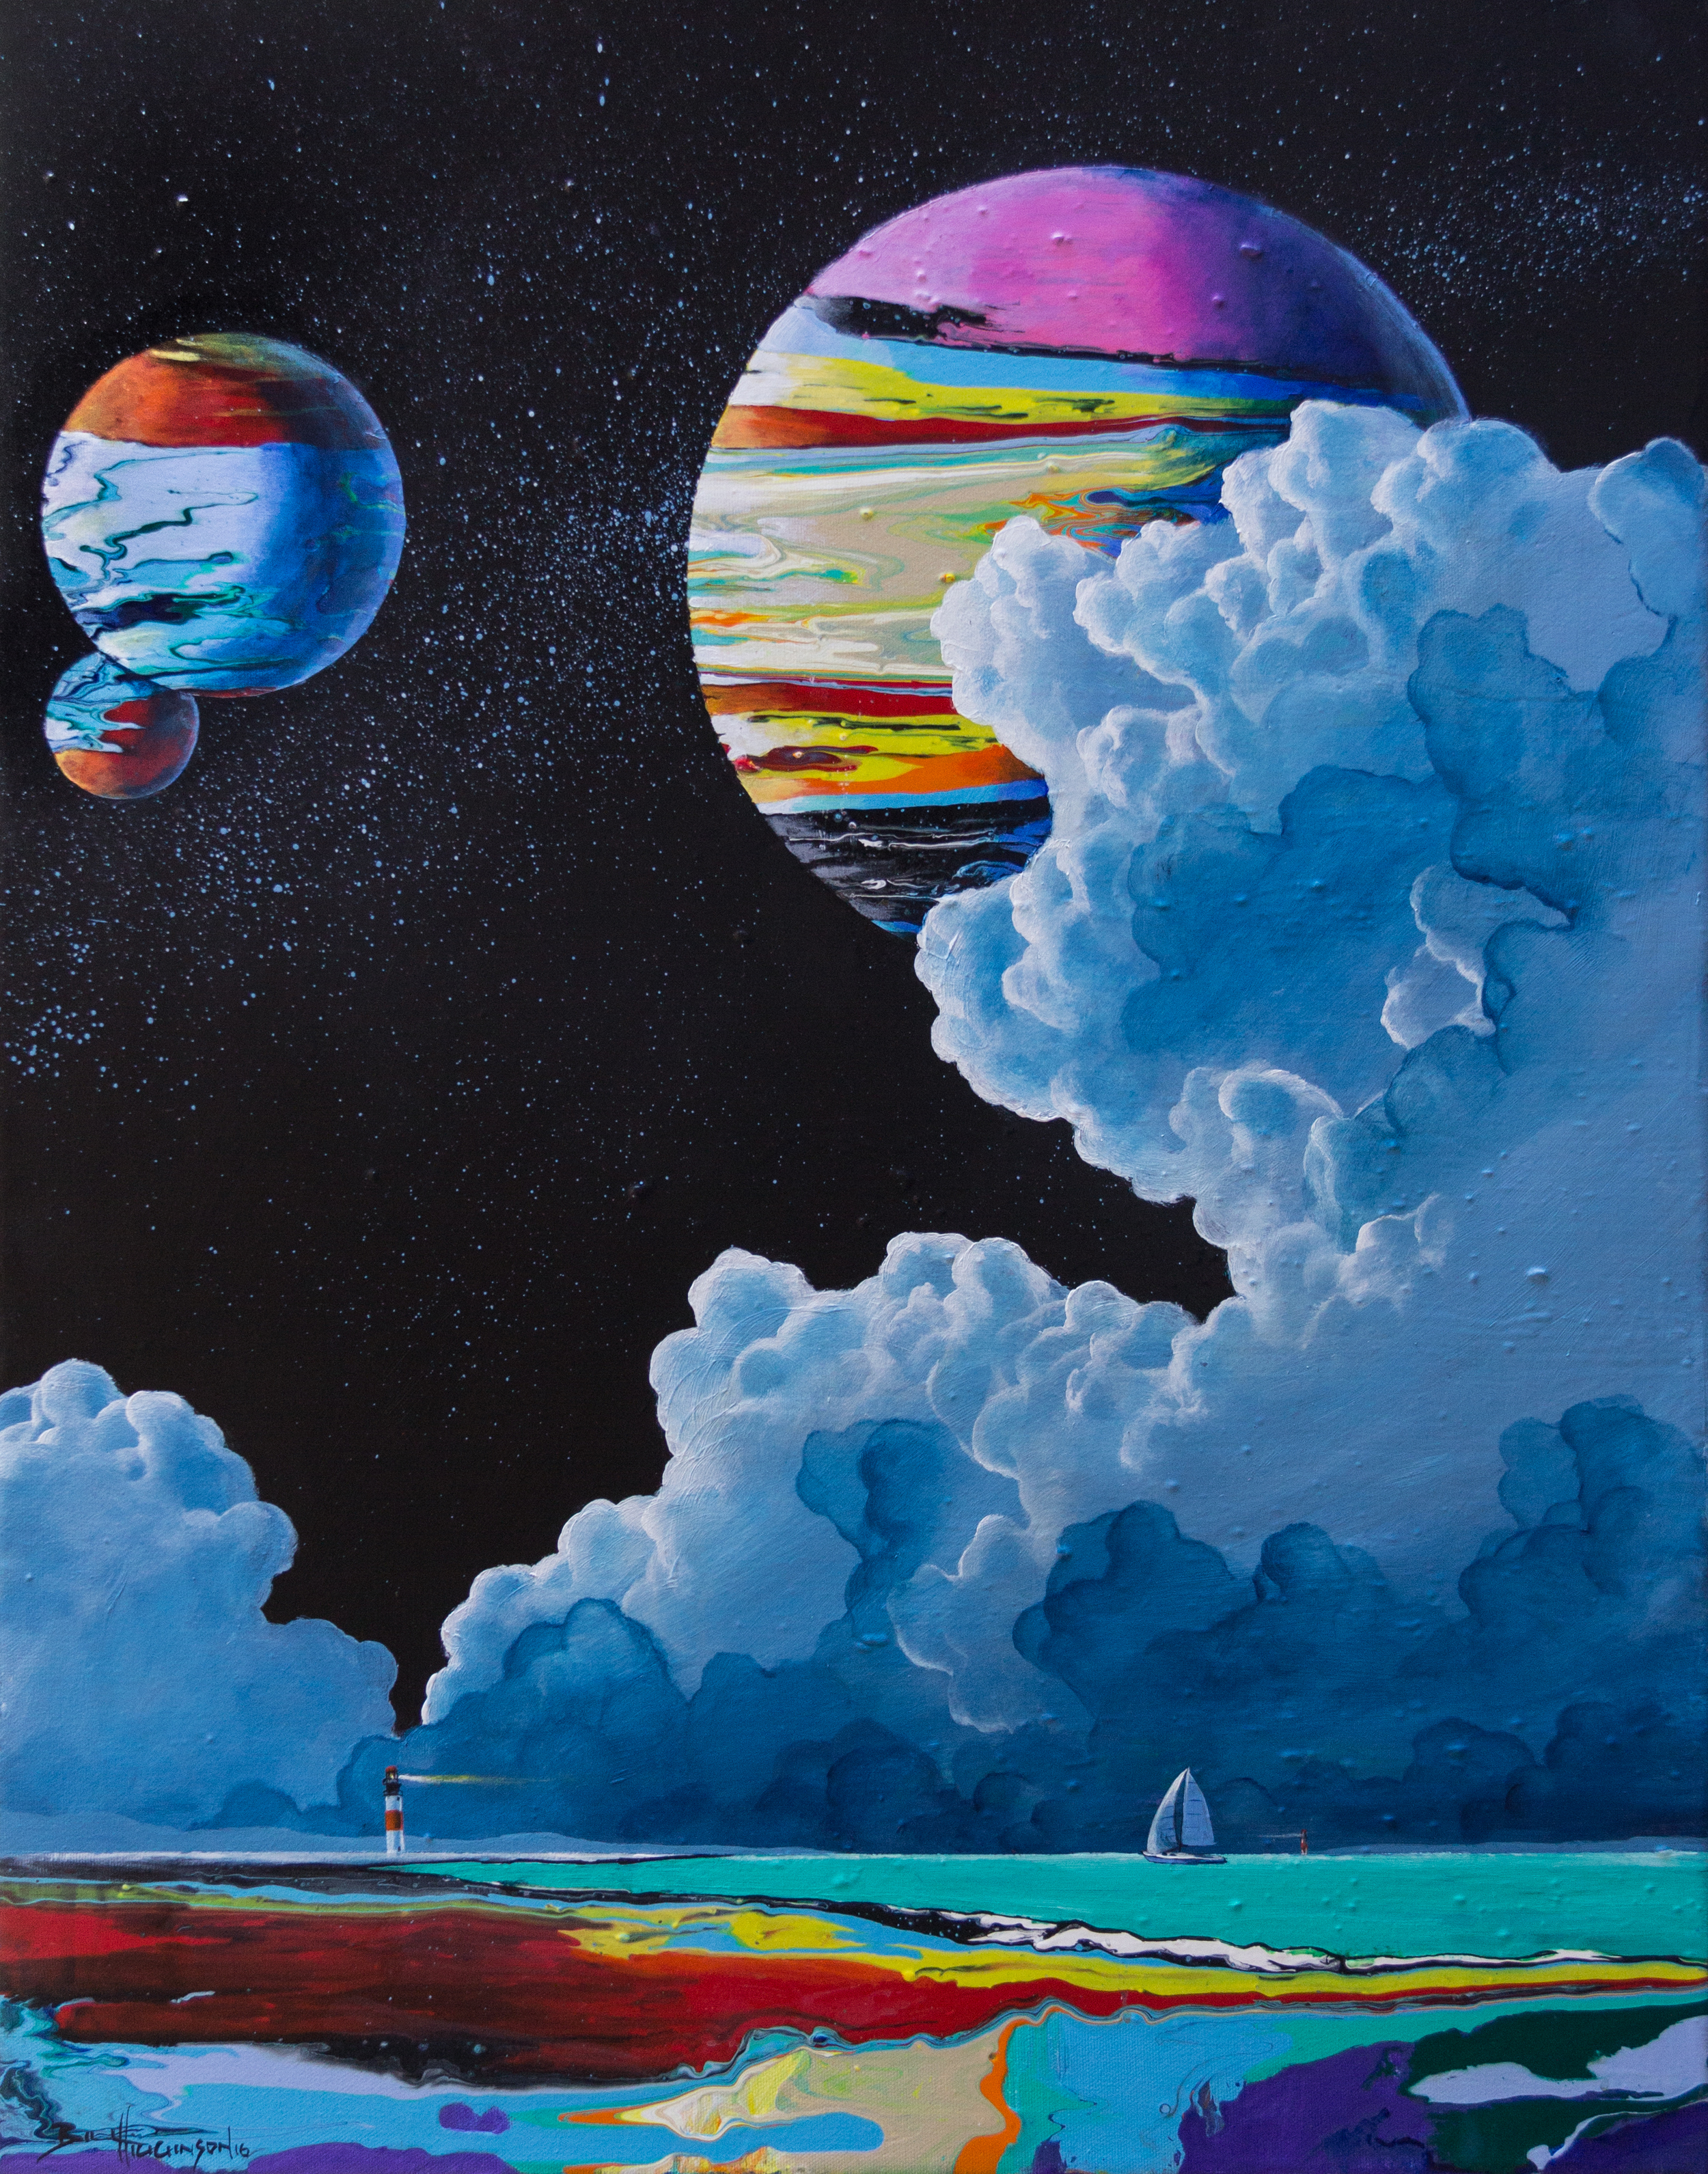 bill-higginson/art/can-you-see-it/fantasy-landscape-surrealism